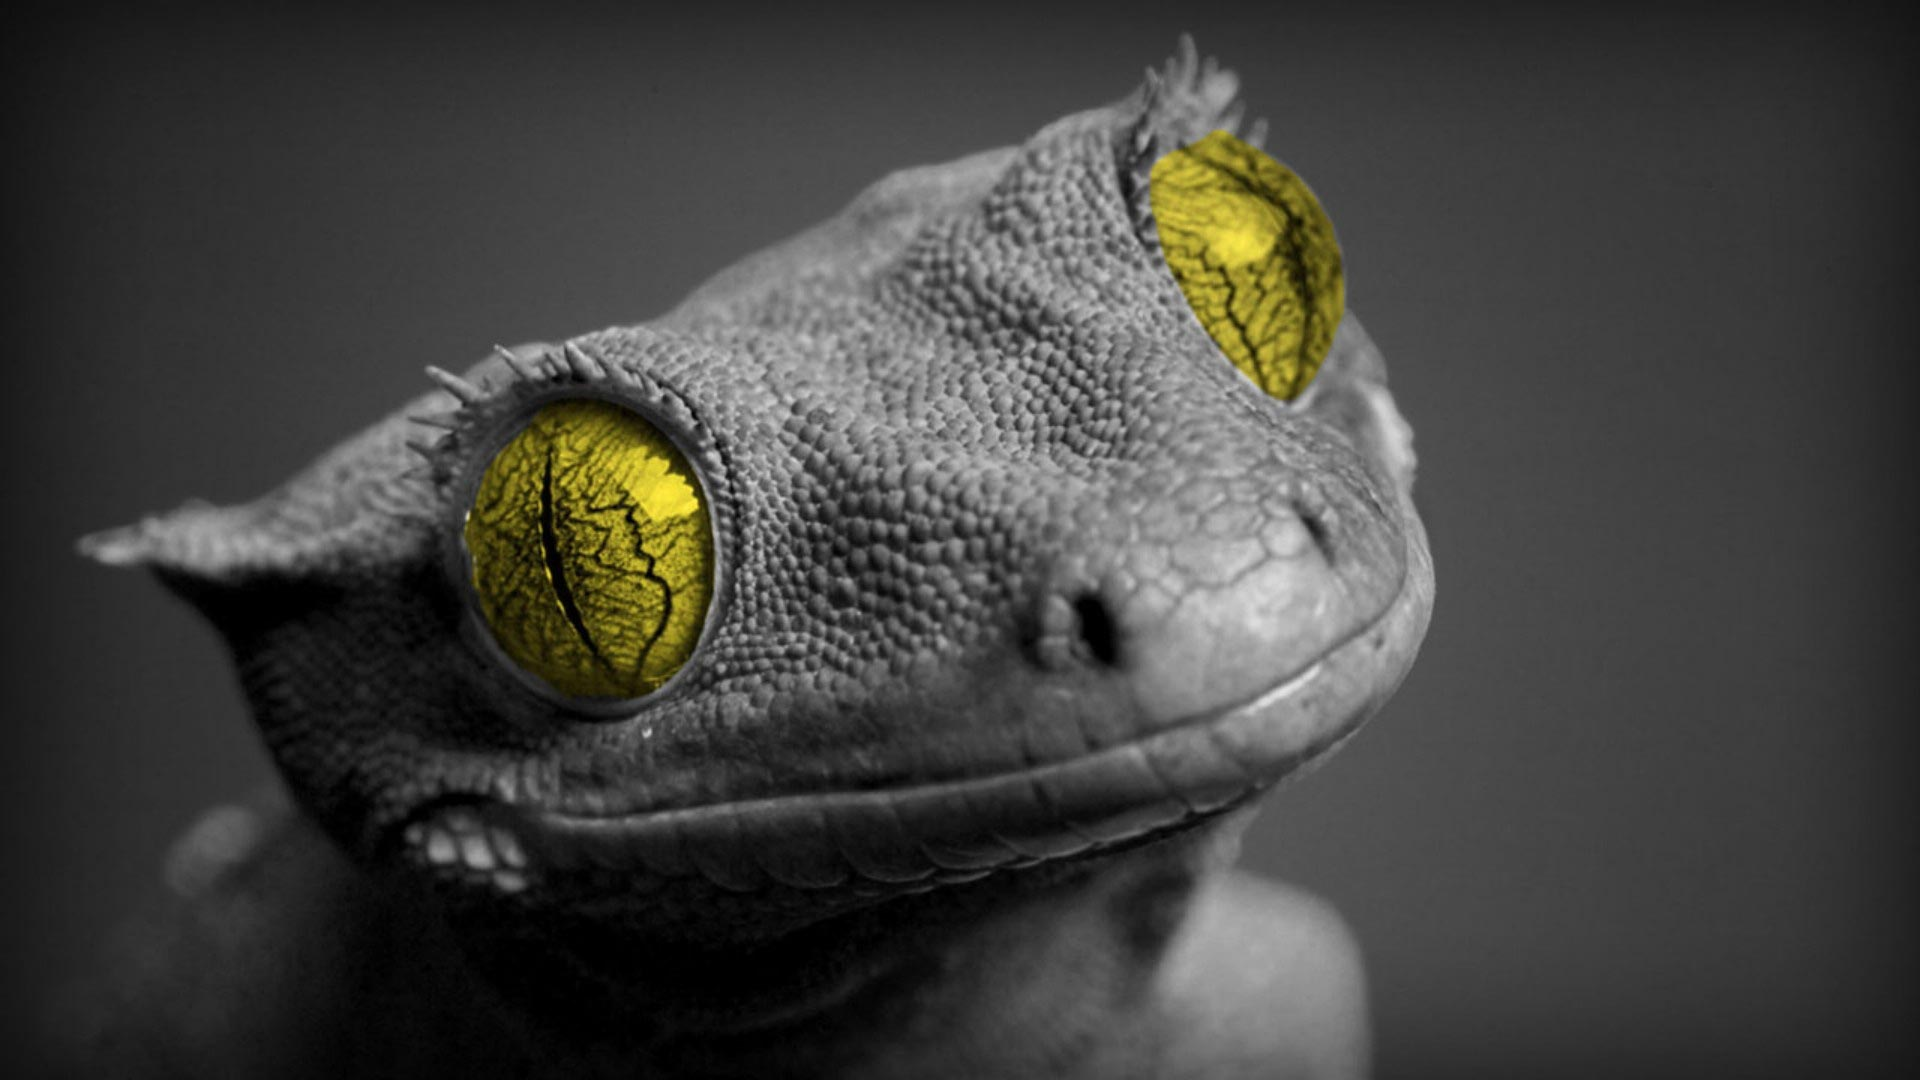 lizard image